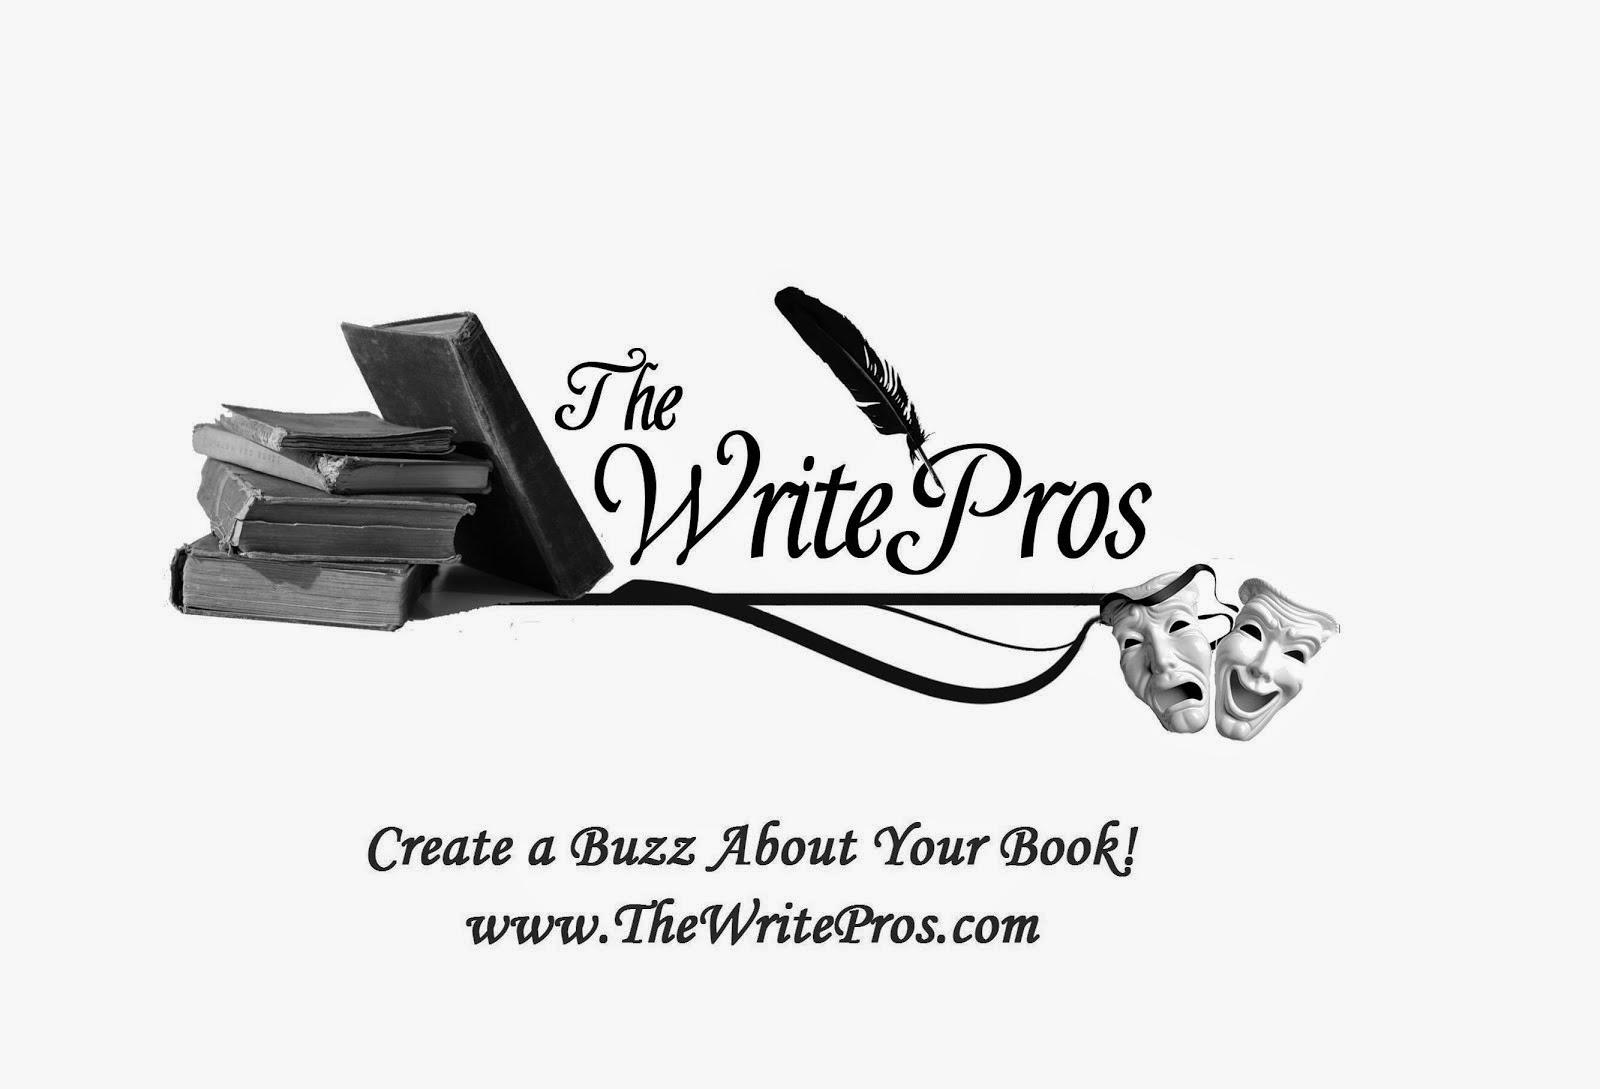 TheWritePros.com